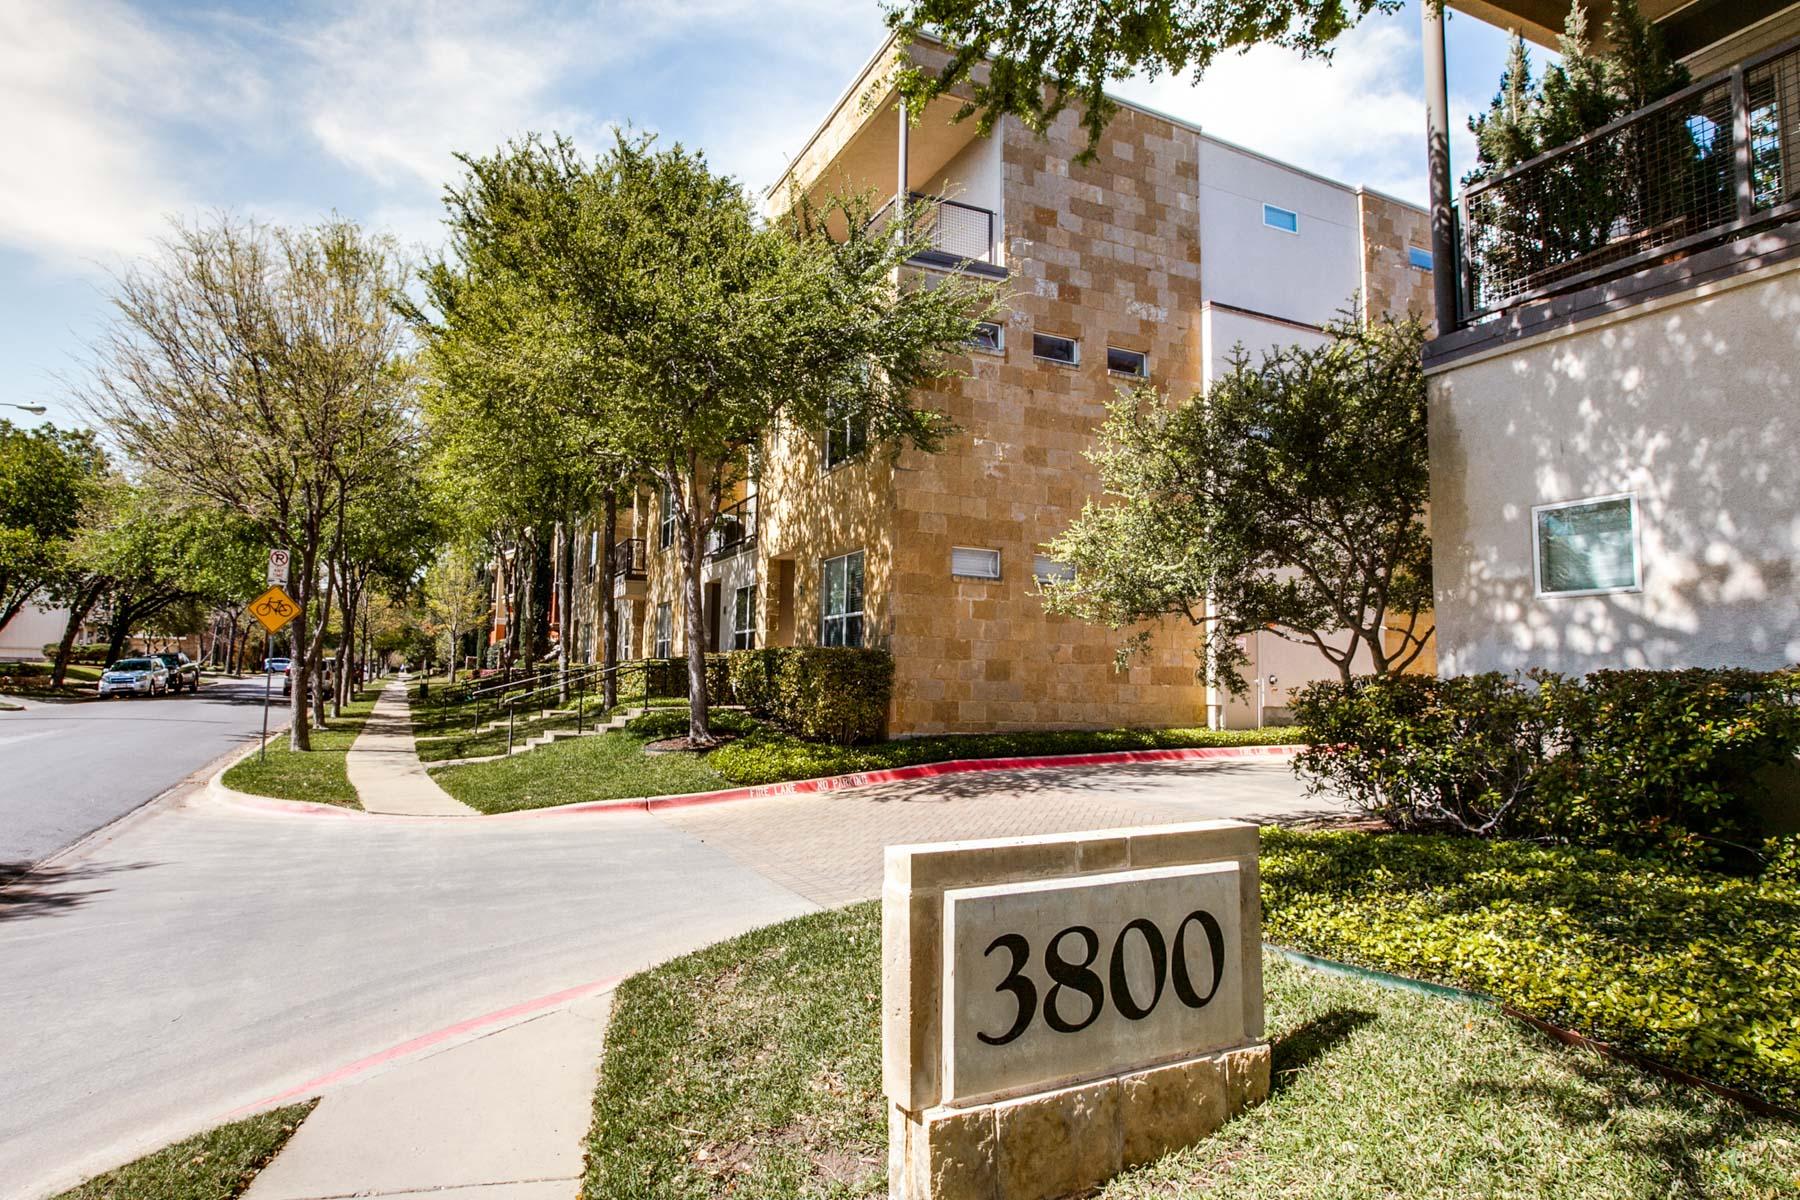 Townhouse for Sale at Oak Lawn Condo 3800 Holland Avenue #14 Dallas, Texas, 75219 United States